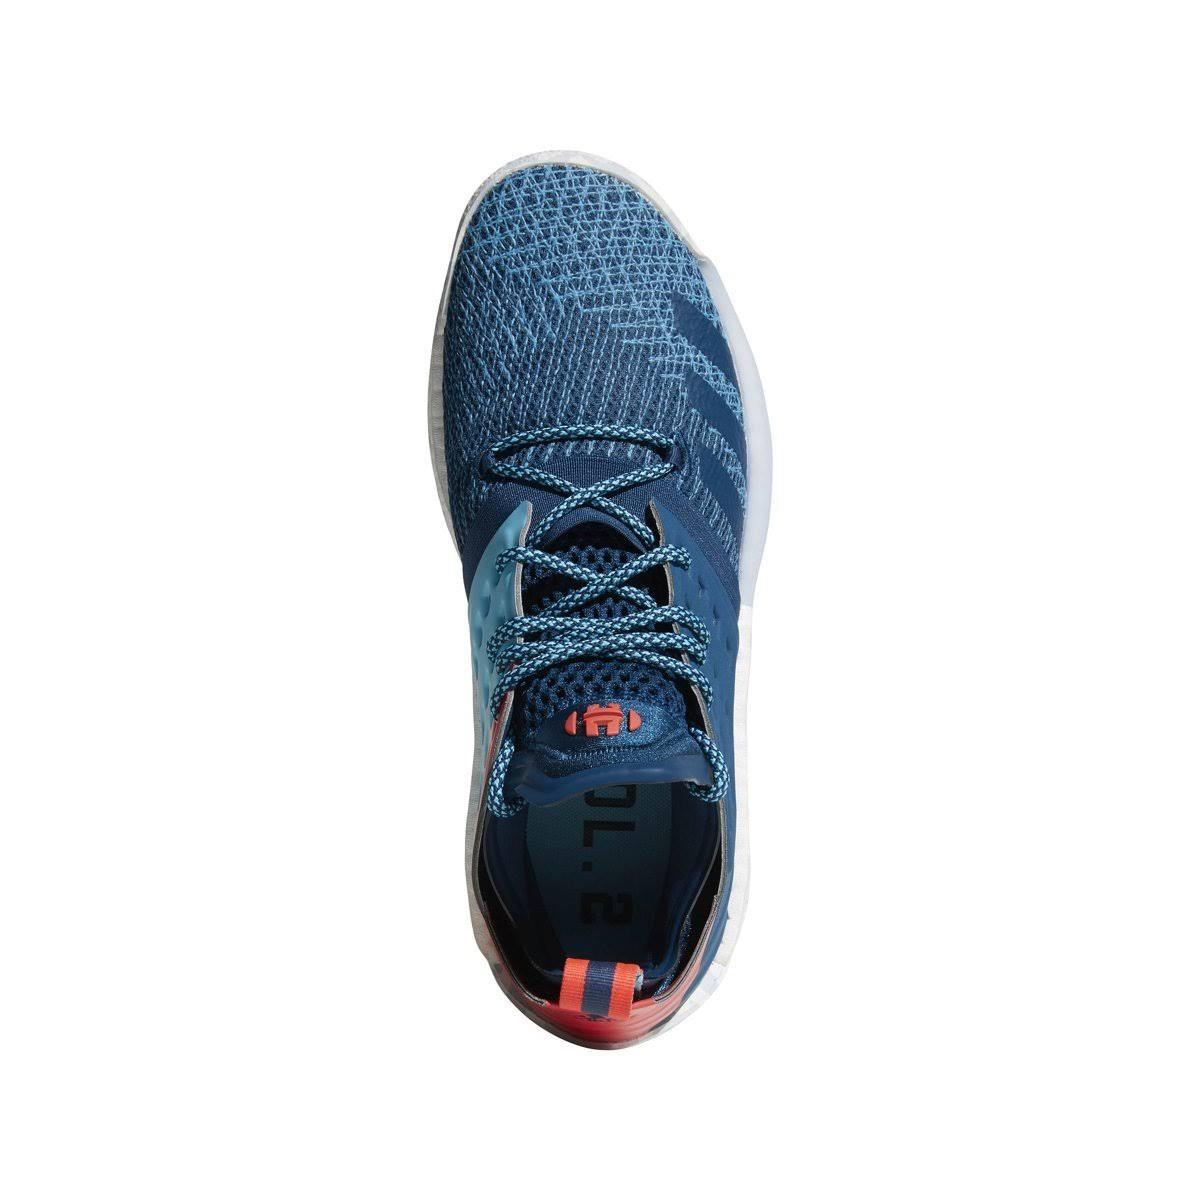 Para Baloncesto Rojo 9 Vol Adidas Hombre 2 Harden Cian 5 De Zapatillas Tamaño Azul Z5YwqUO